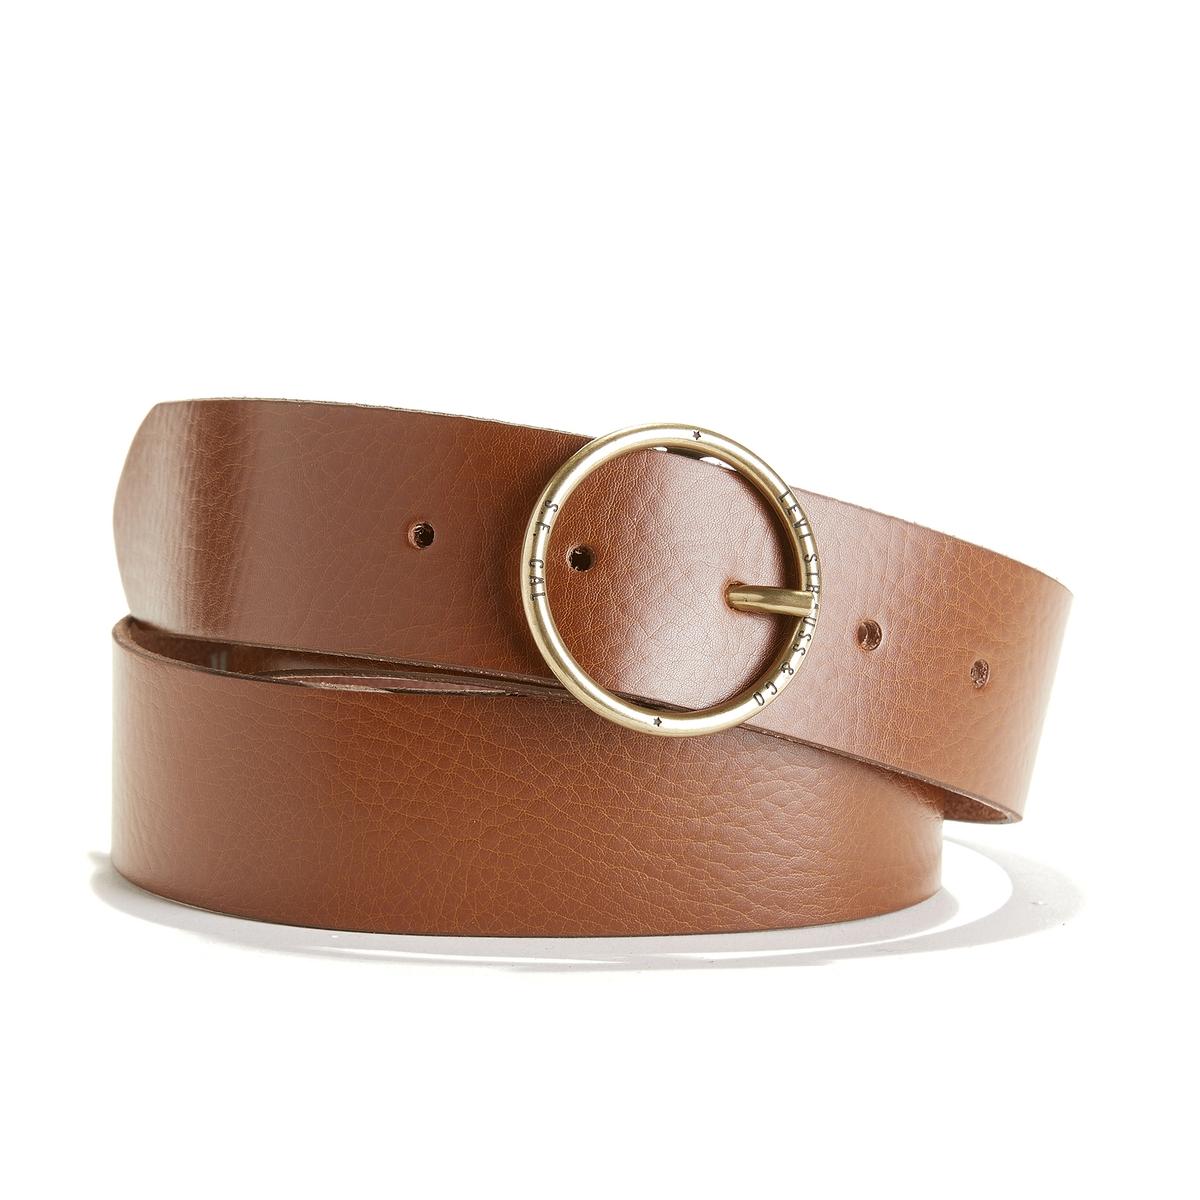 Cinturón de piel Fashion Circle Belt